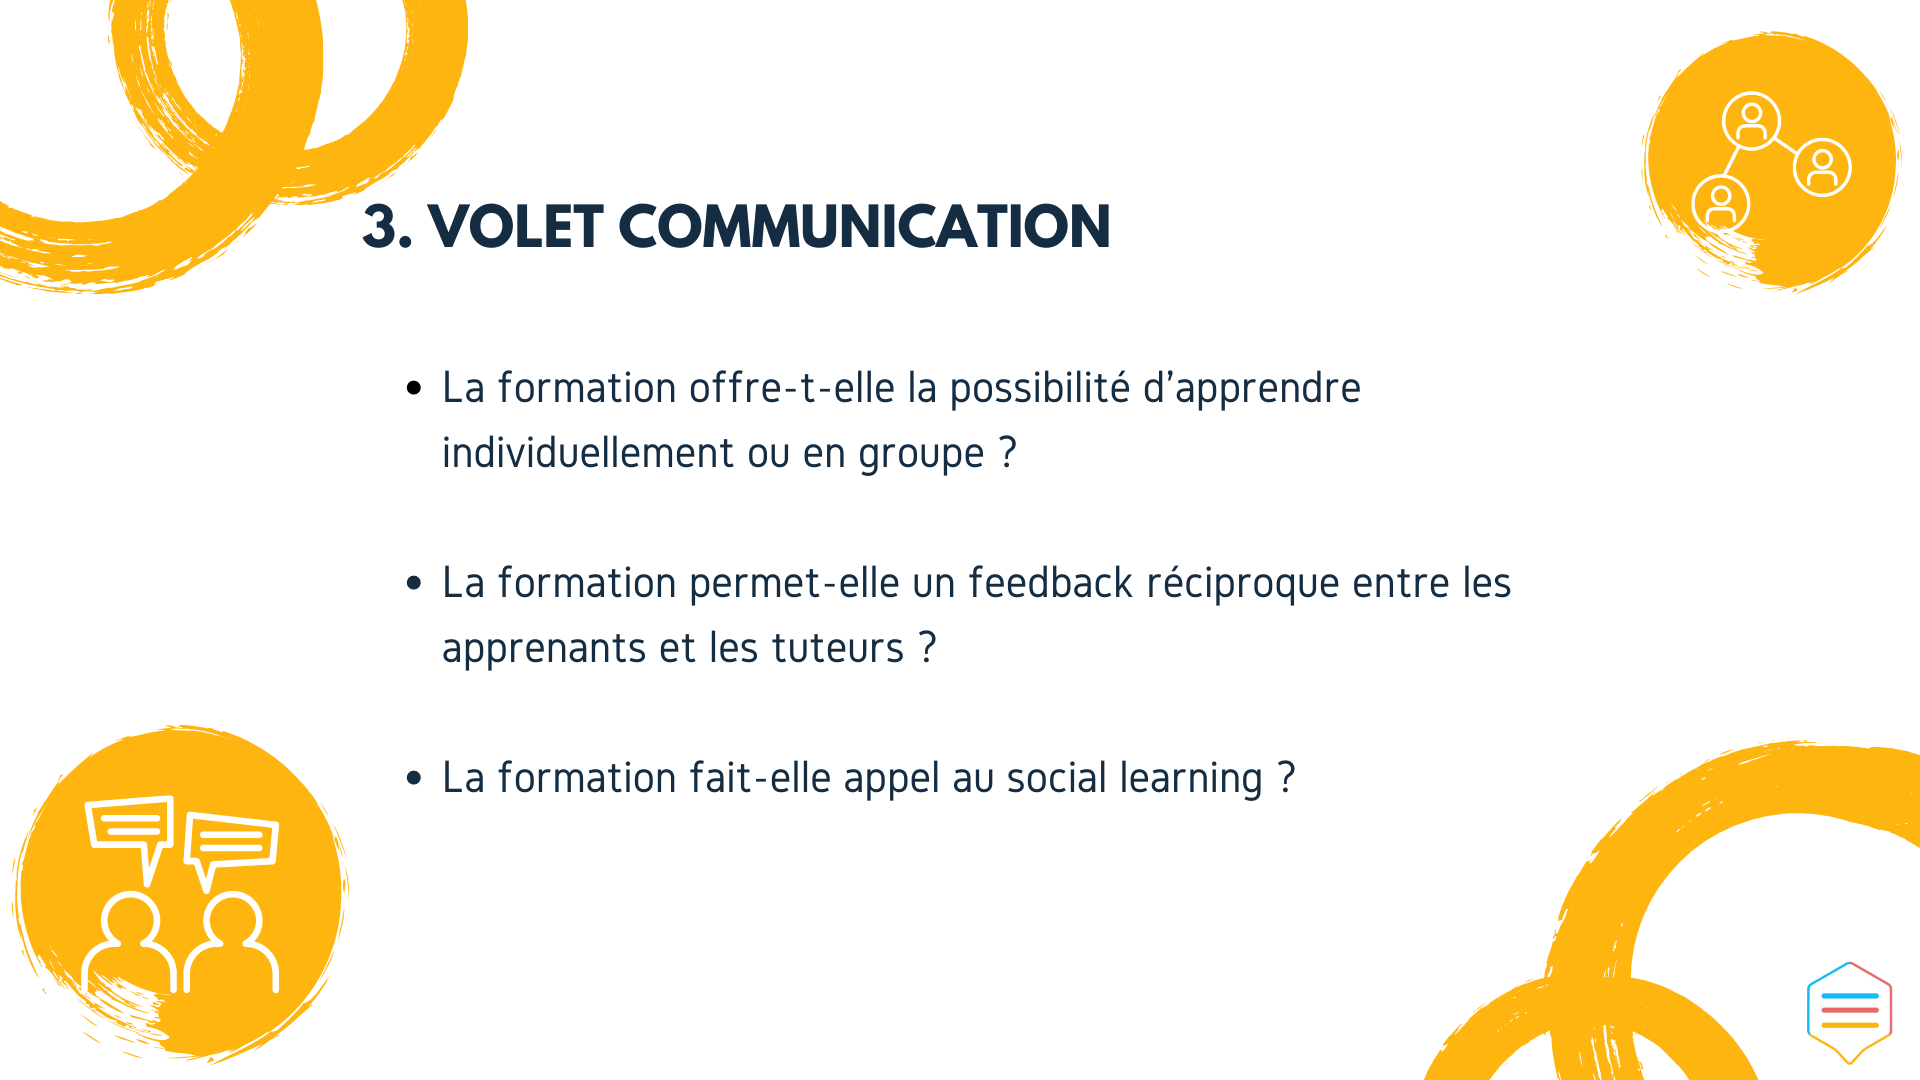 volet communication